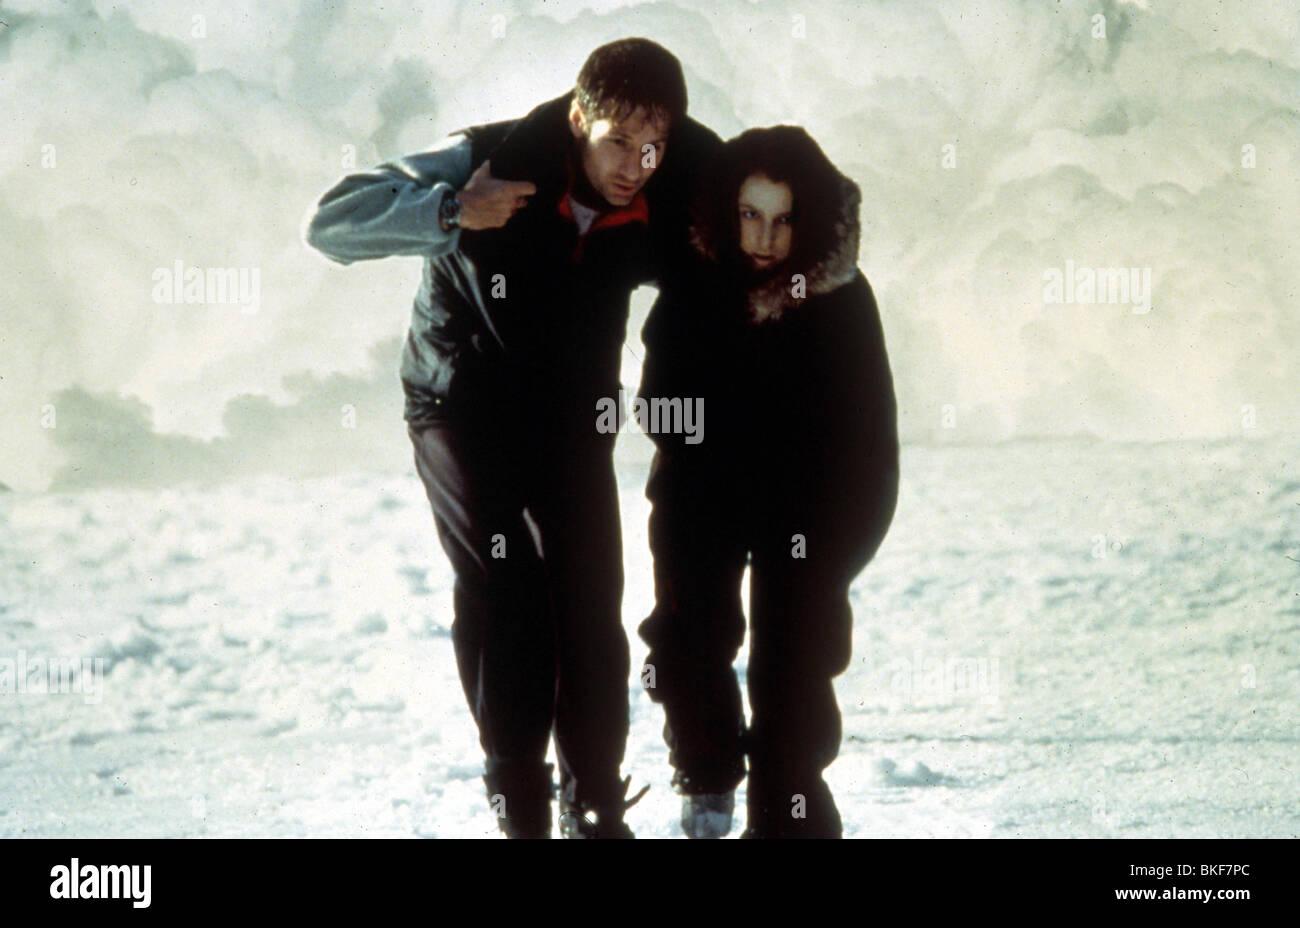 X-FILES: THE MOVIE (1998) DAVID DUCHOVNY, GILLIAN ANDERSON XFM 042 - Stock Image